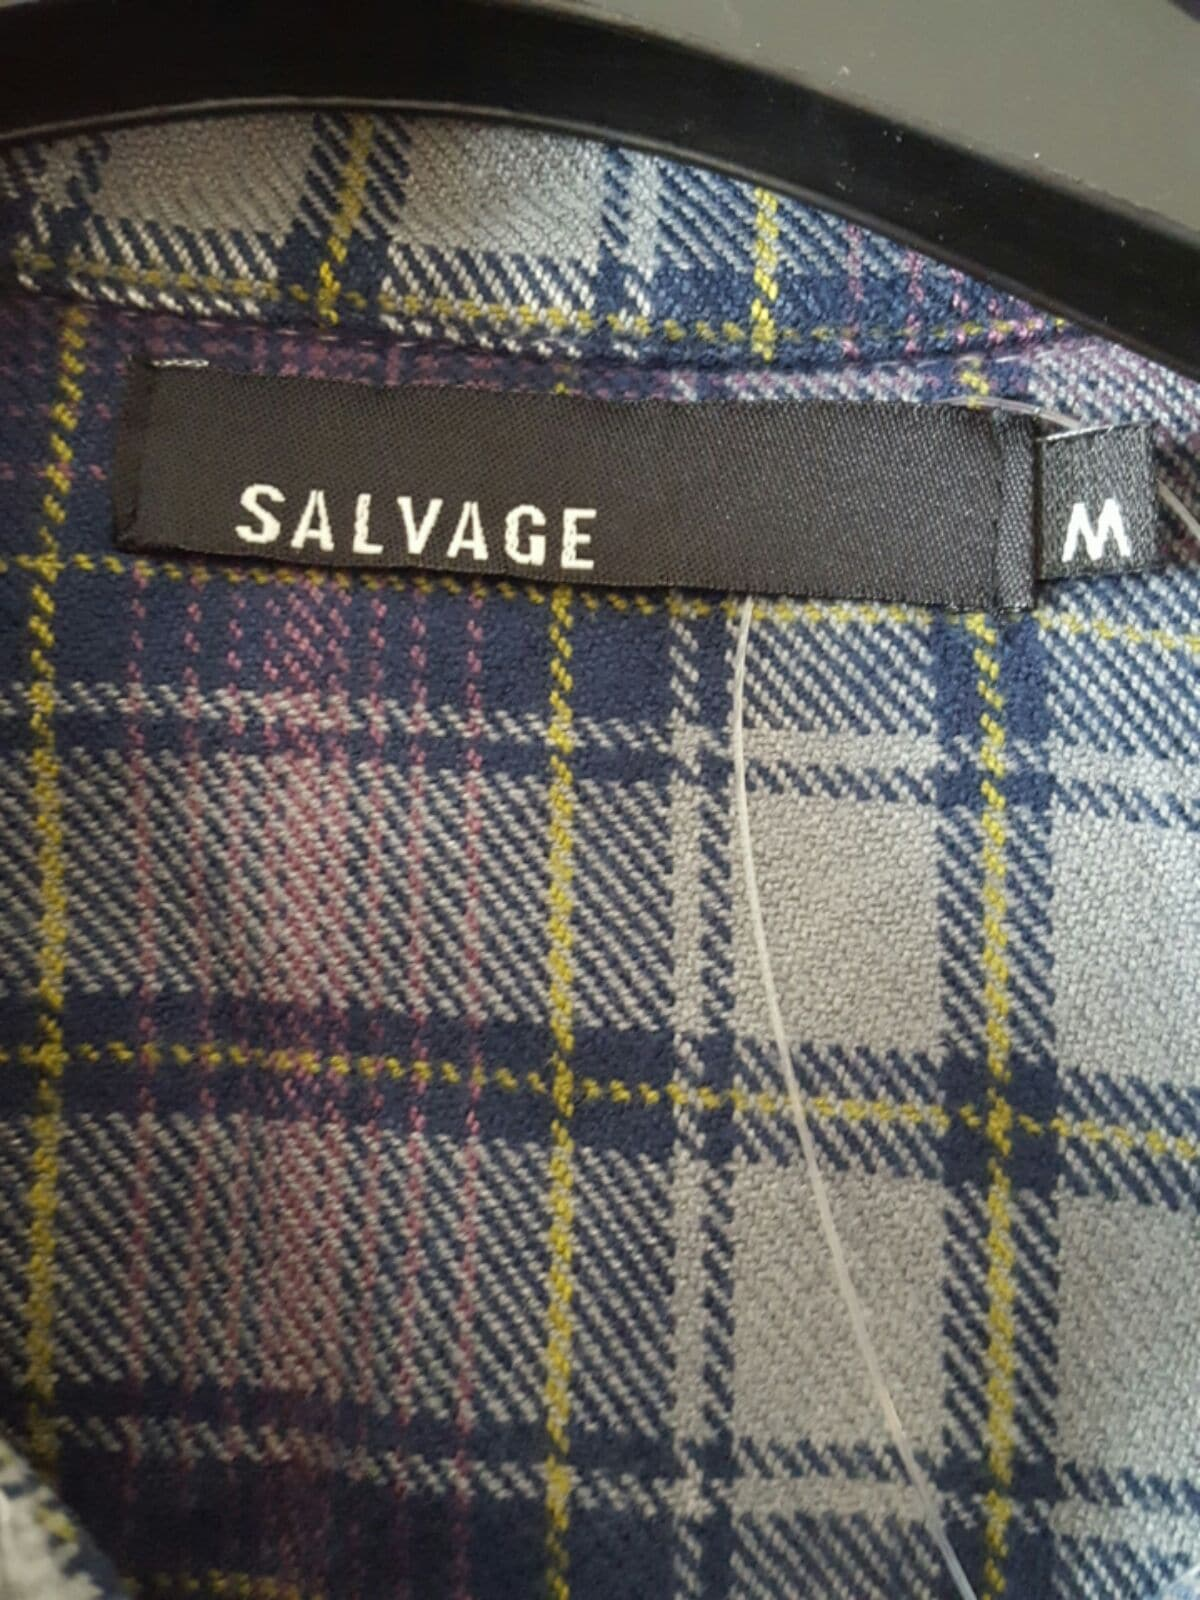 SALVAGE(サルベージ)のシャツブラウス